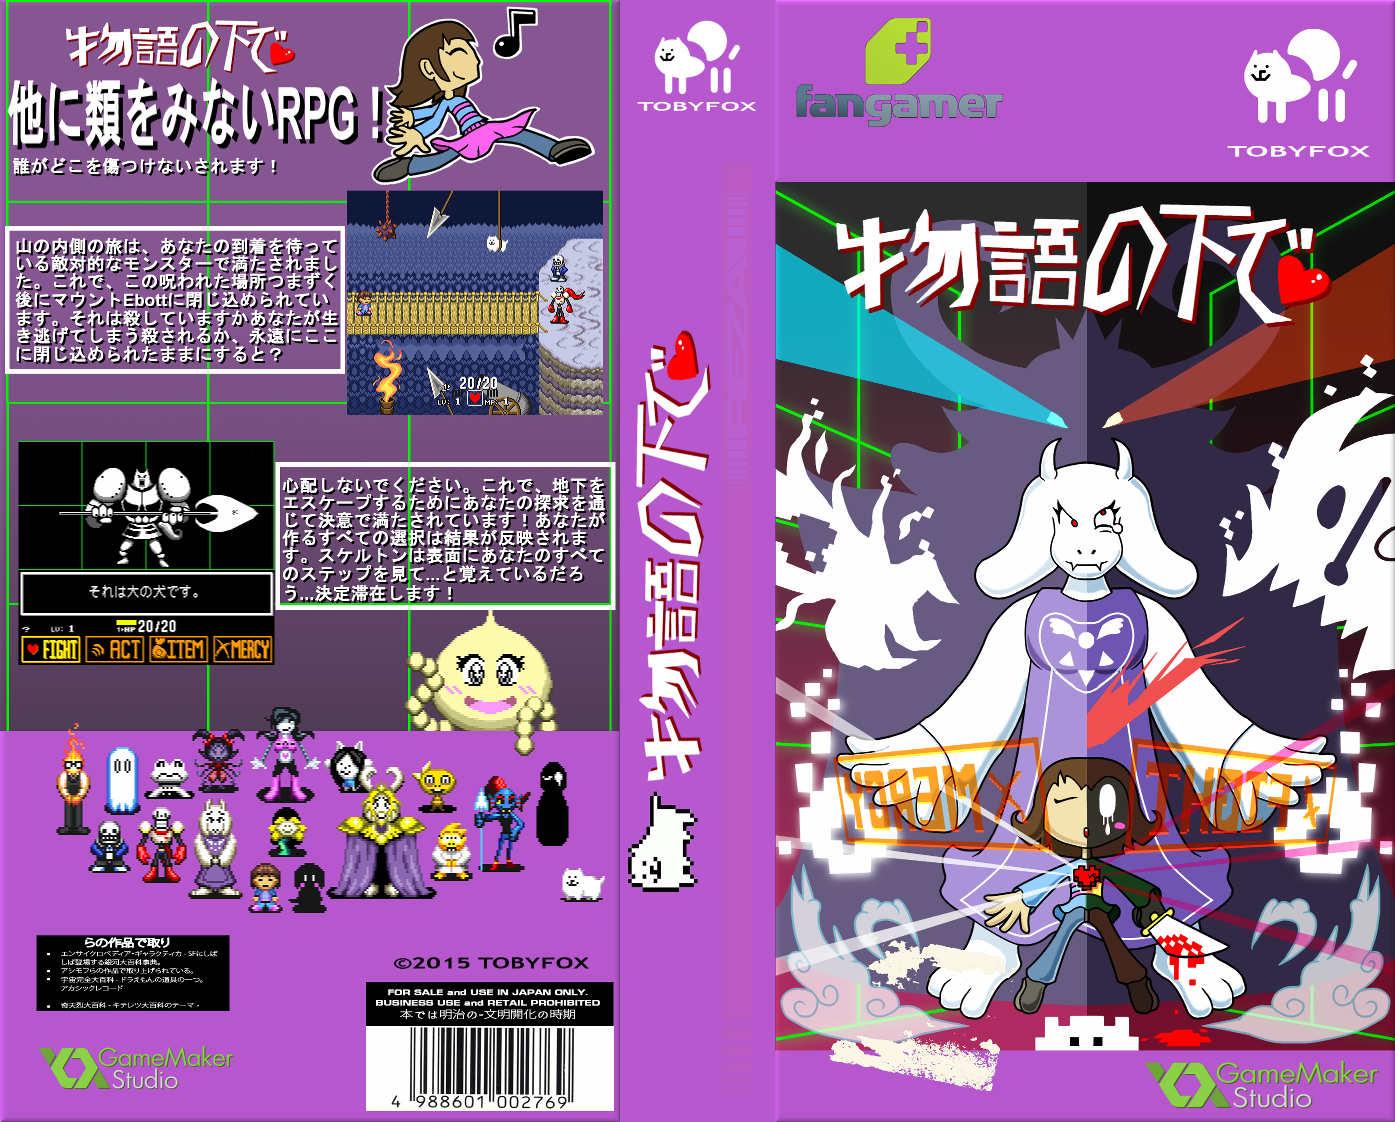 Happy 1st Anniversary Undertale in style of Super Famicom Box art